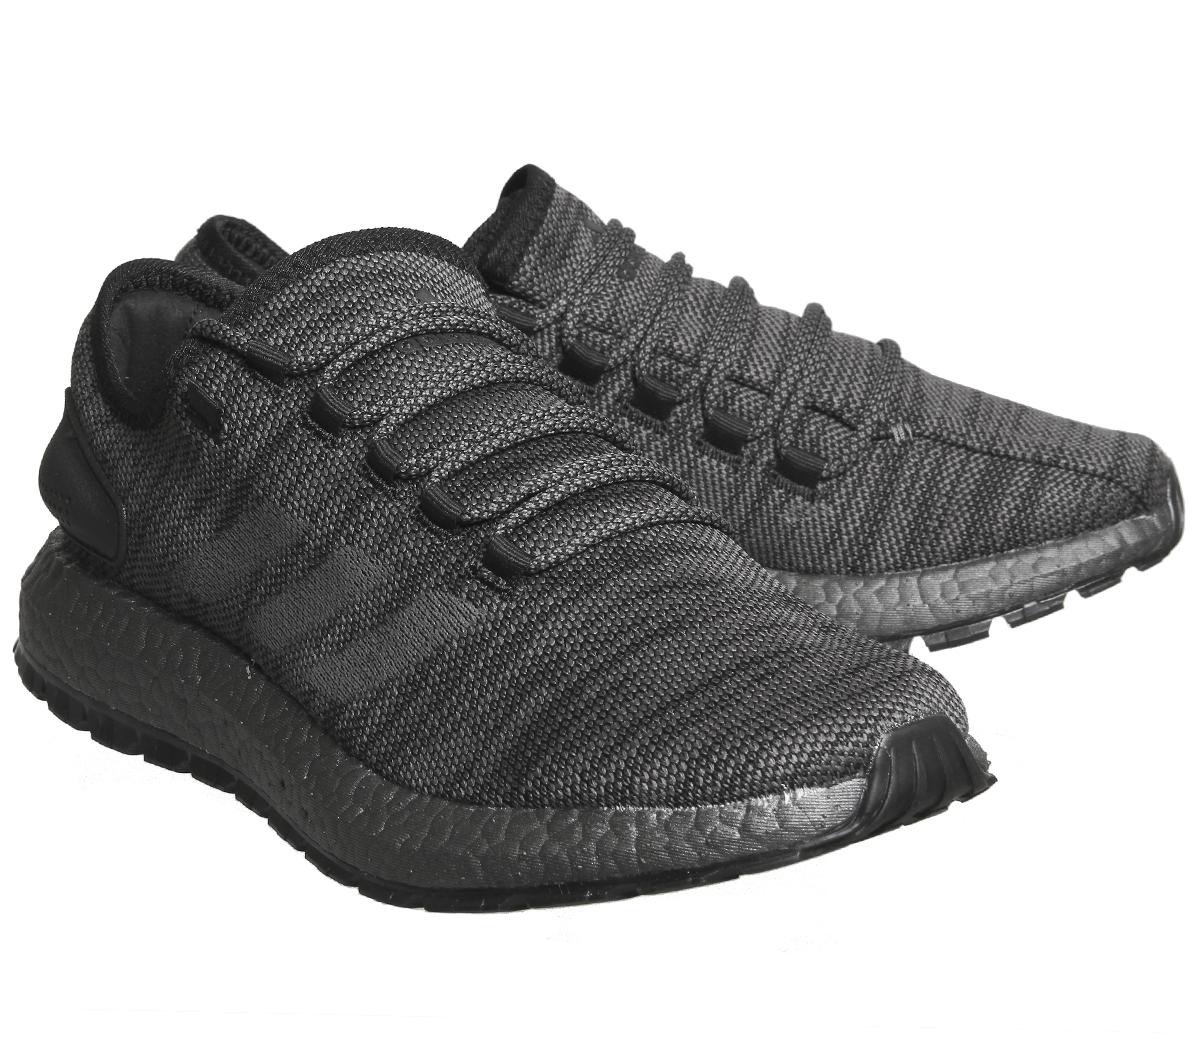 b7a3d13242171 Adidas Pureboost Atr Trainers Black Solid Grey Trace Grey Trainers ...